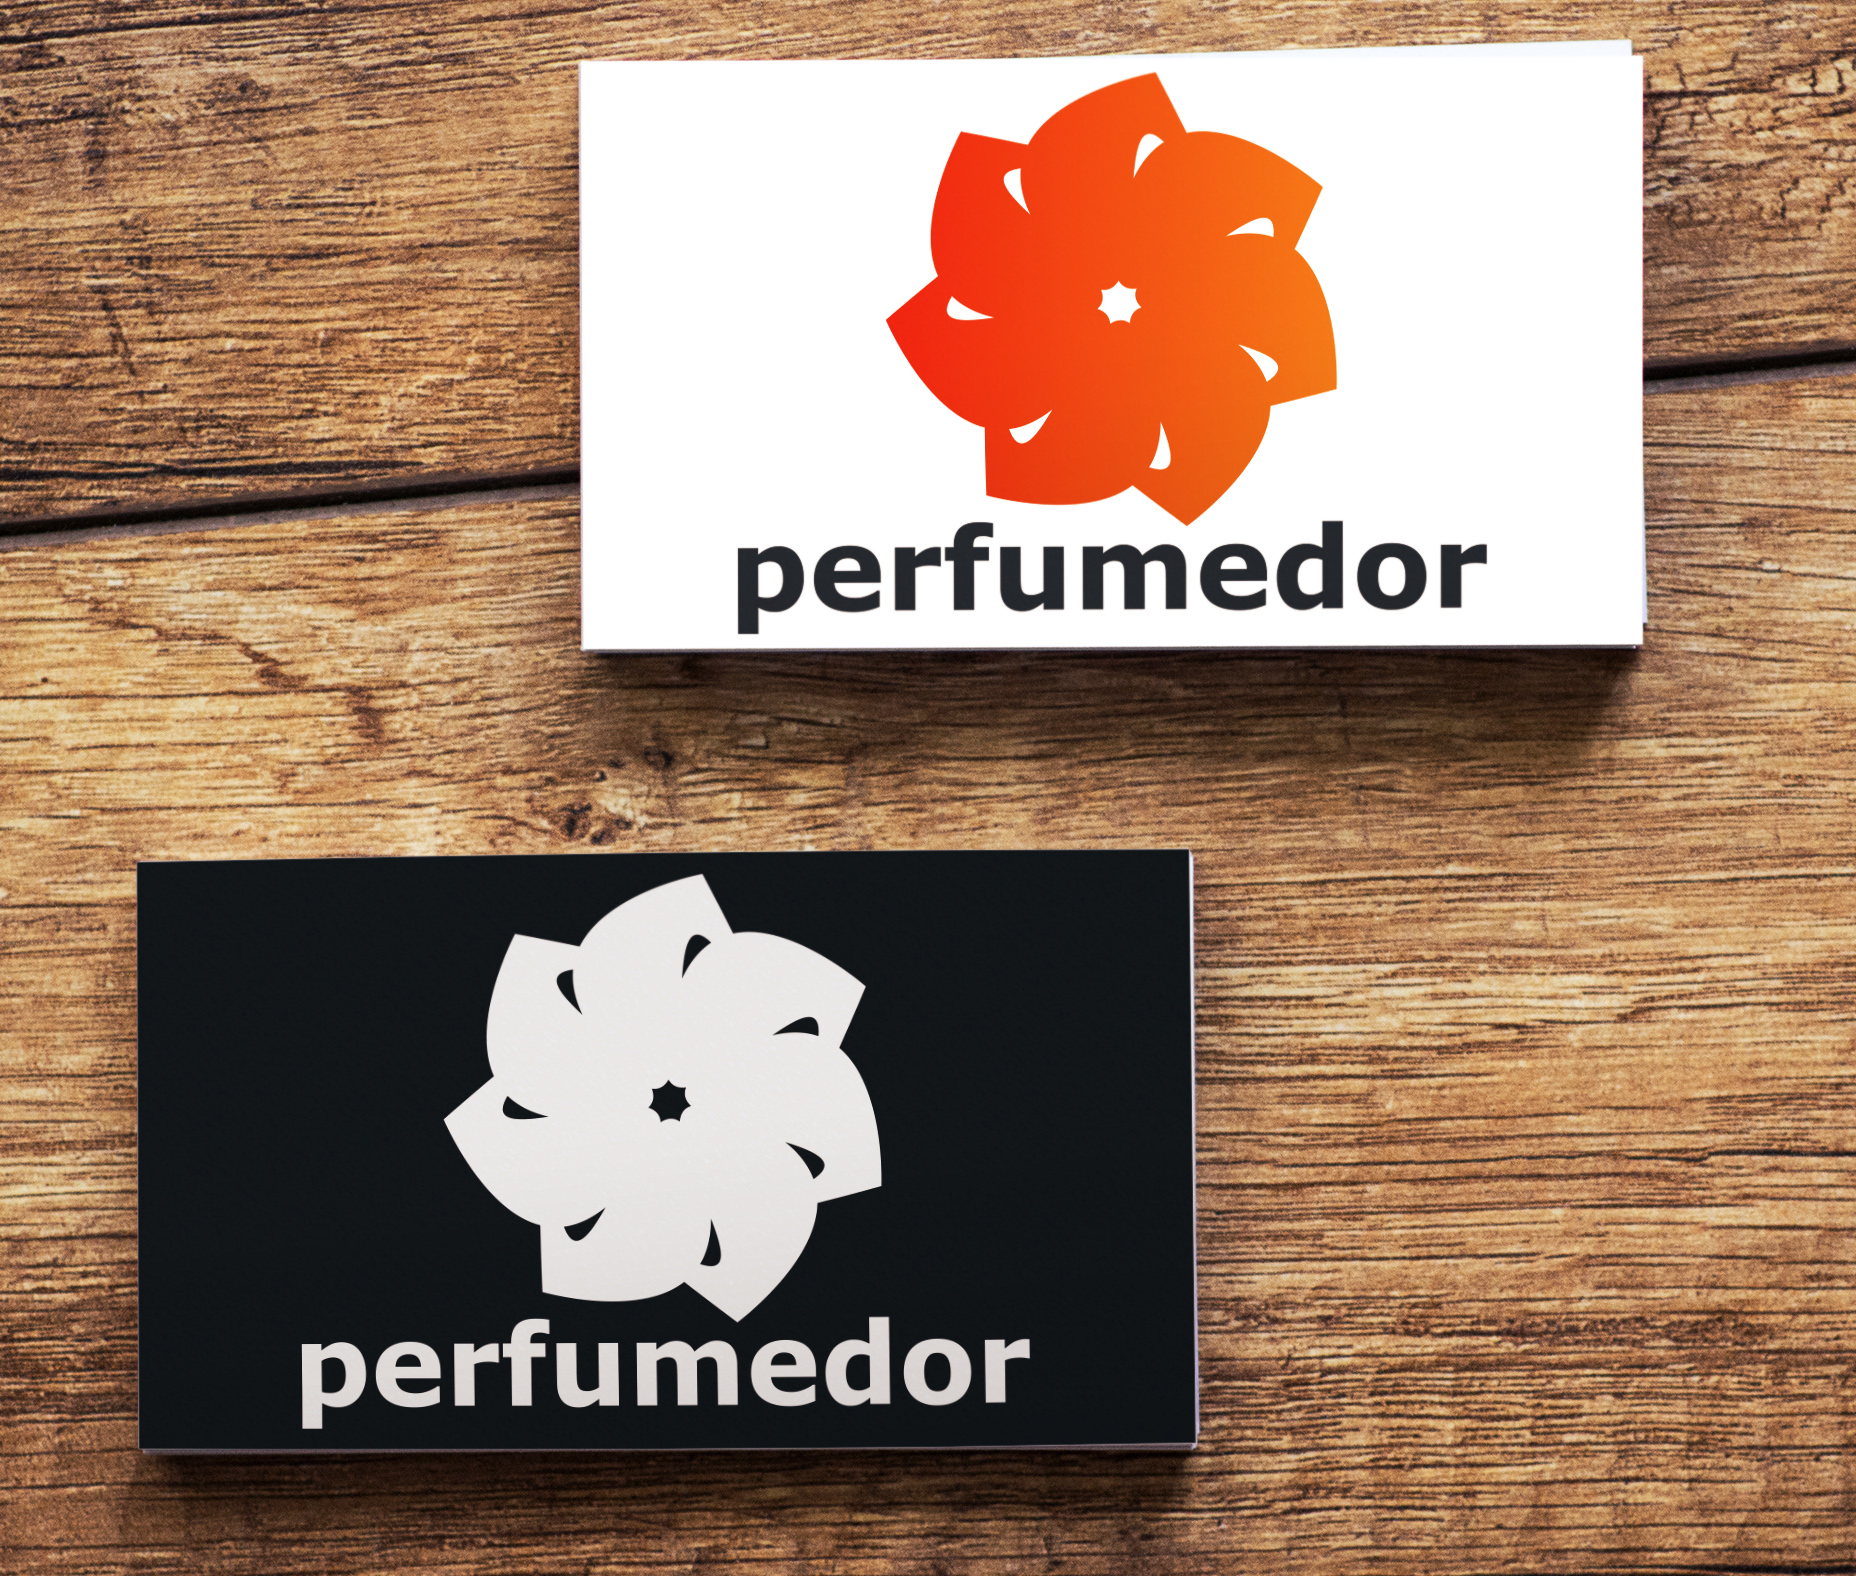 Логотип для интернет-магазина парфюмерии фото f_1885b447fb008cfb.jpg